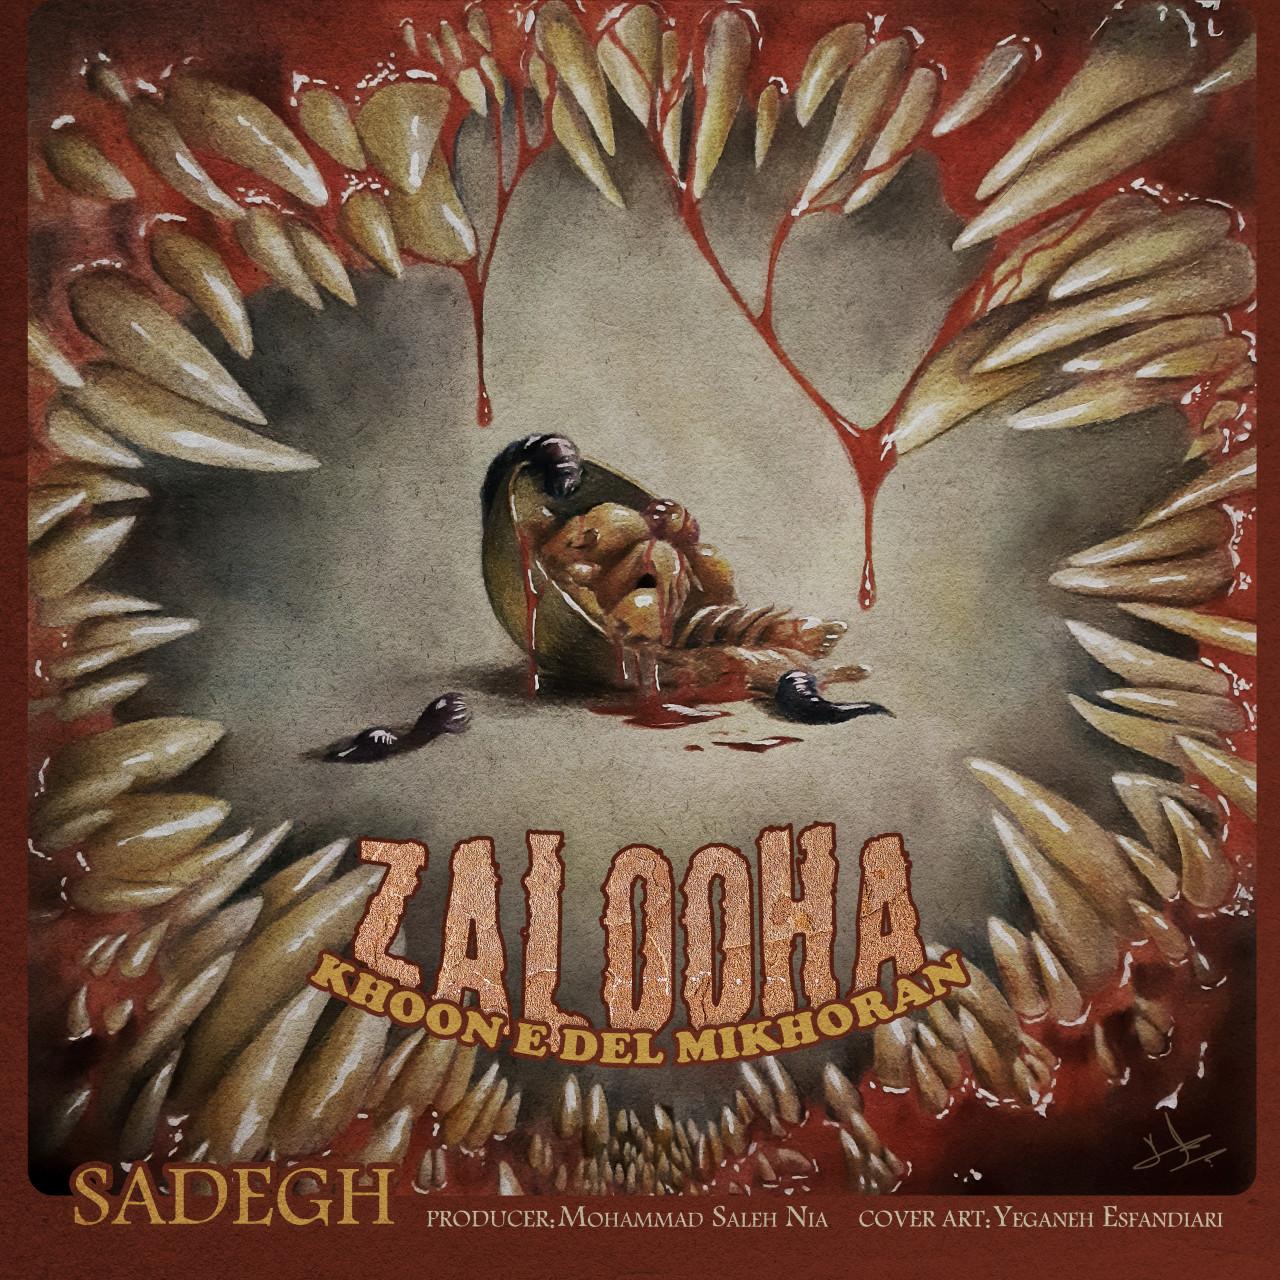 Sadegh - Zalooha Khoone Del Mikhoran